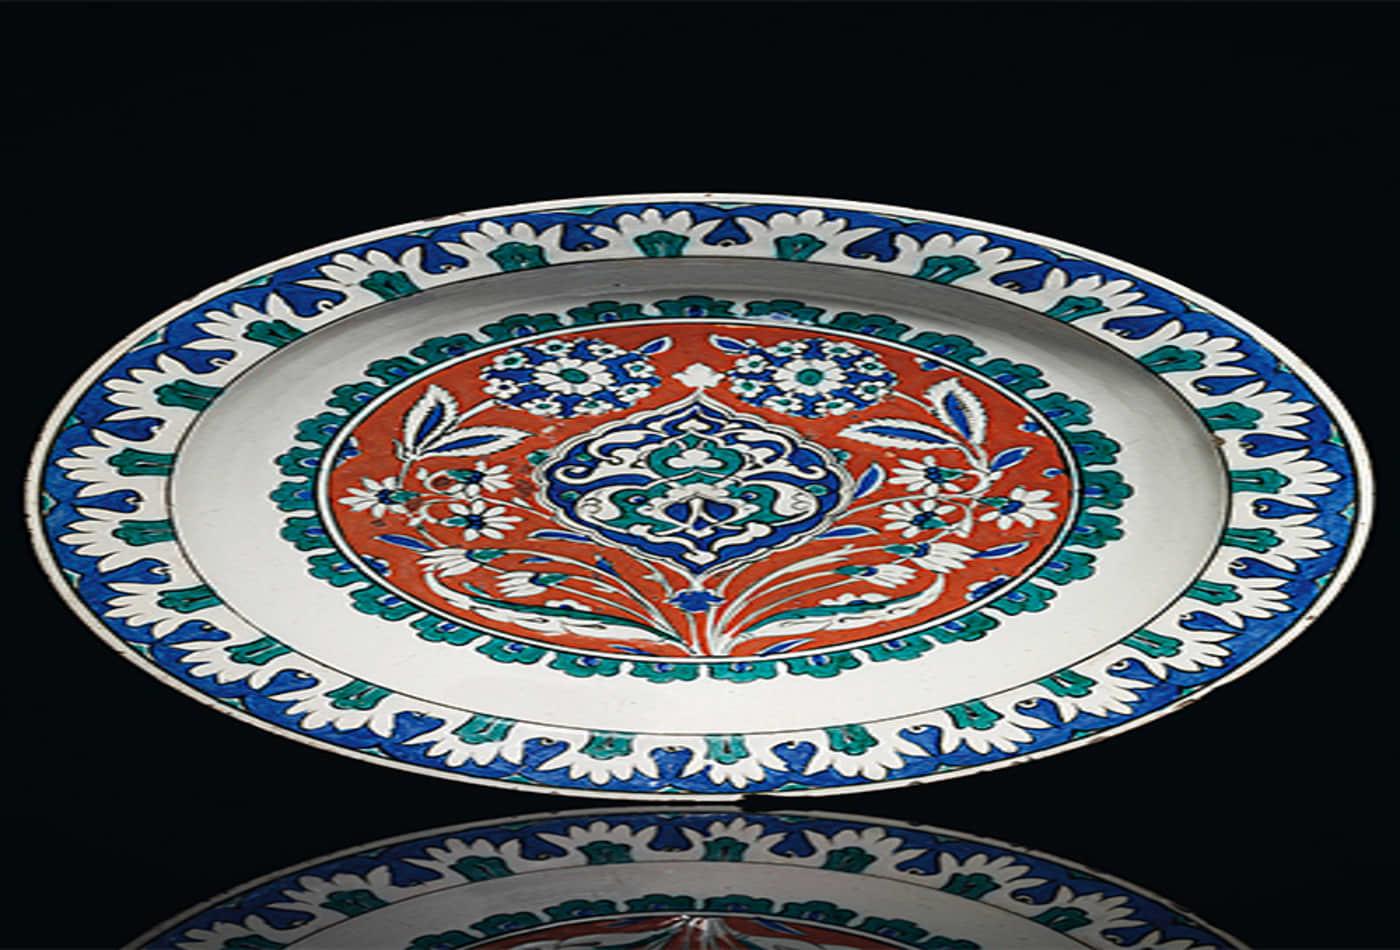 48743553 Investing-in-turkish-treaures-Iznik-dish-round.jpg